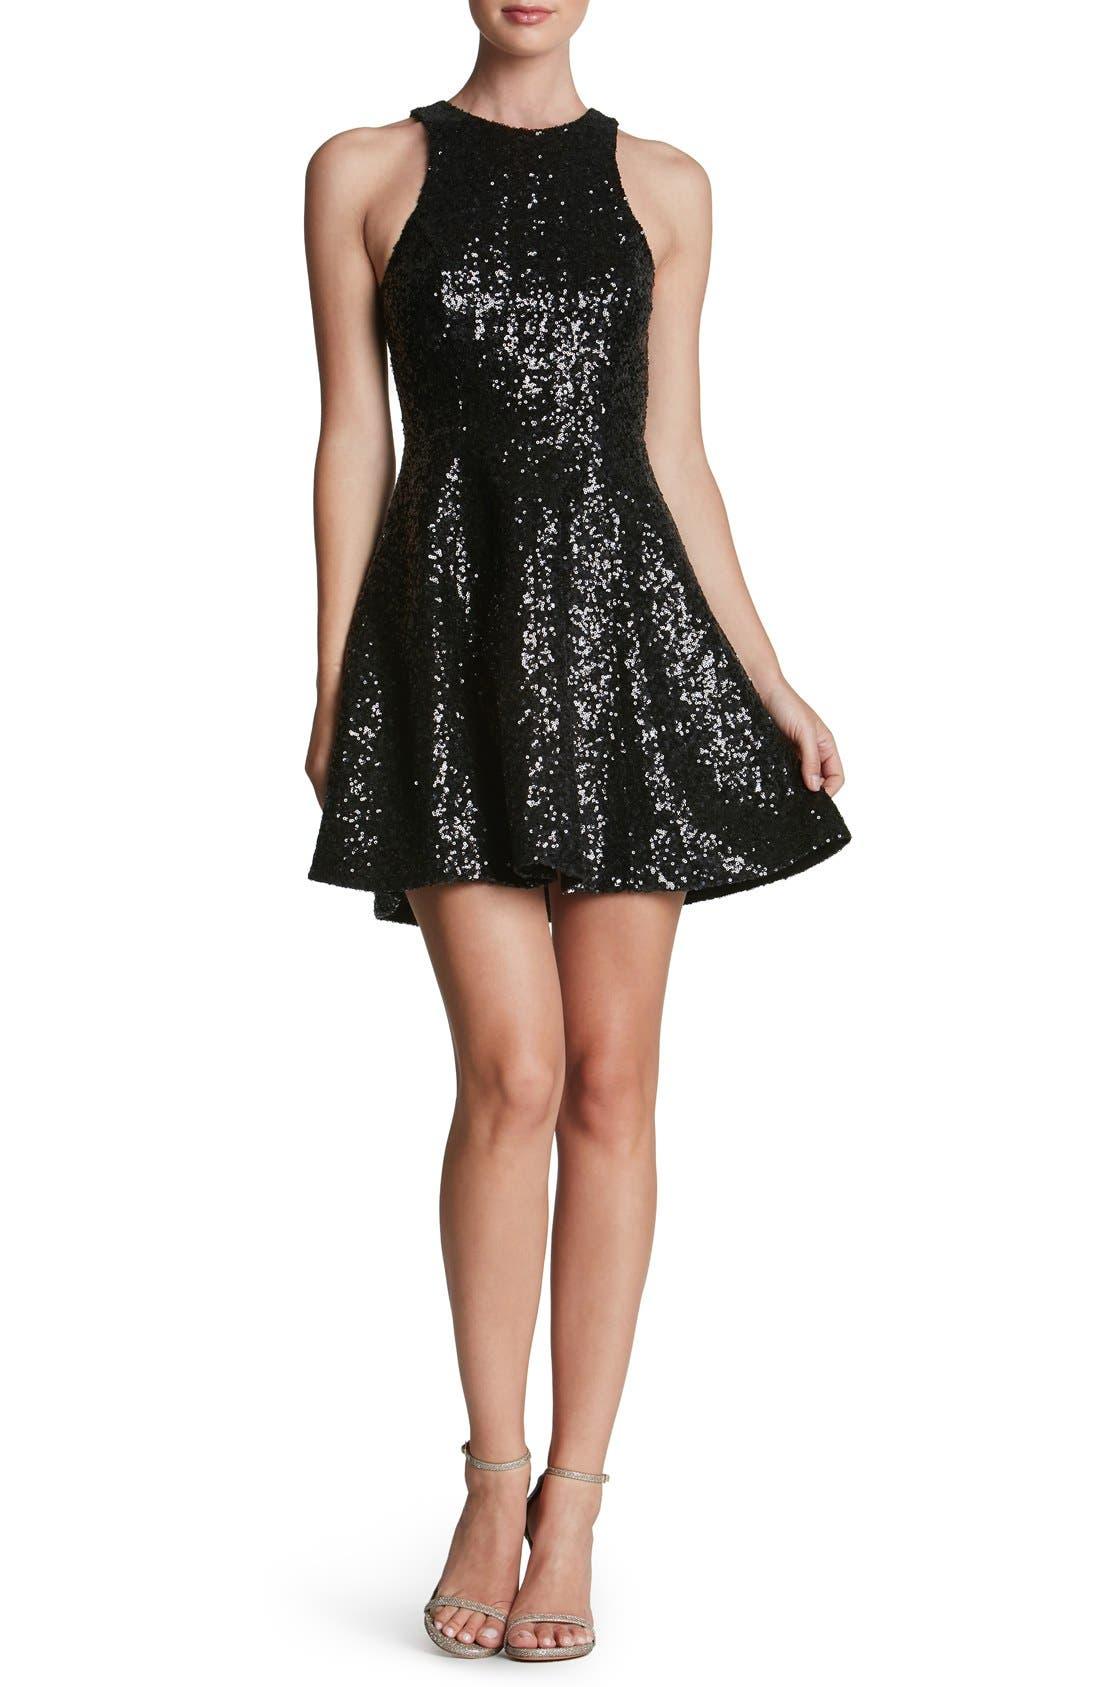 Main Image - Dress the Population 'Ginger' Sequin Fit & Flare Dress